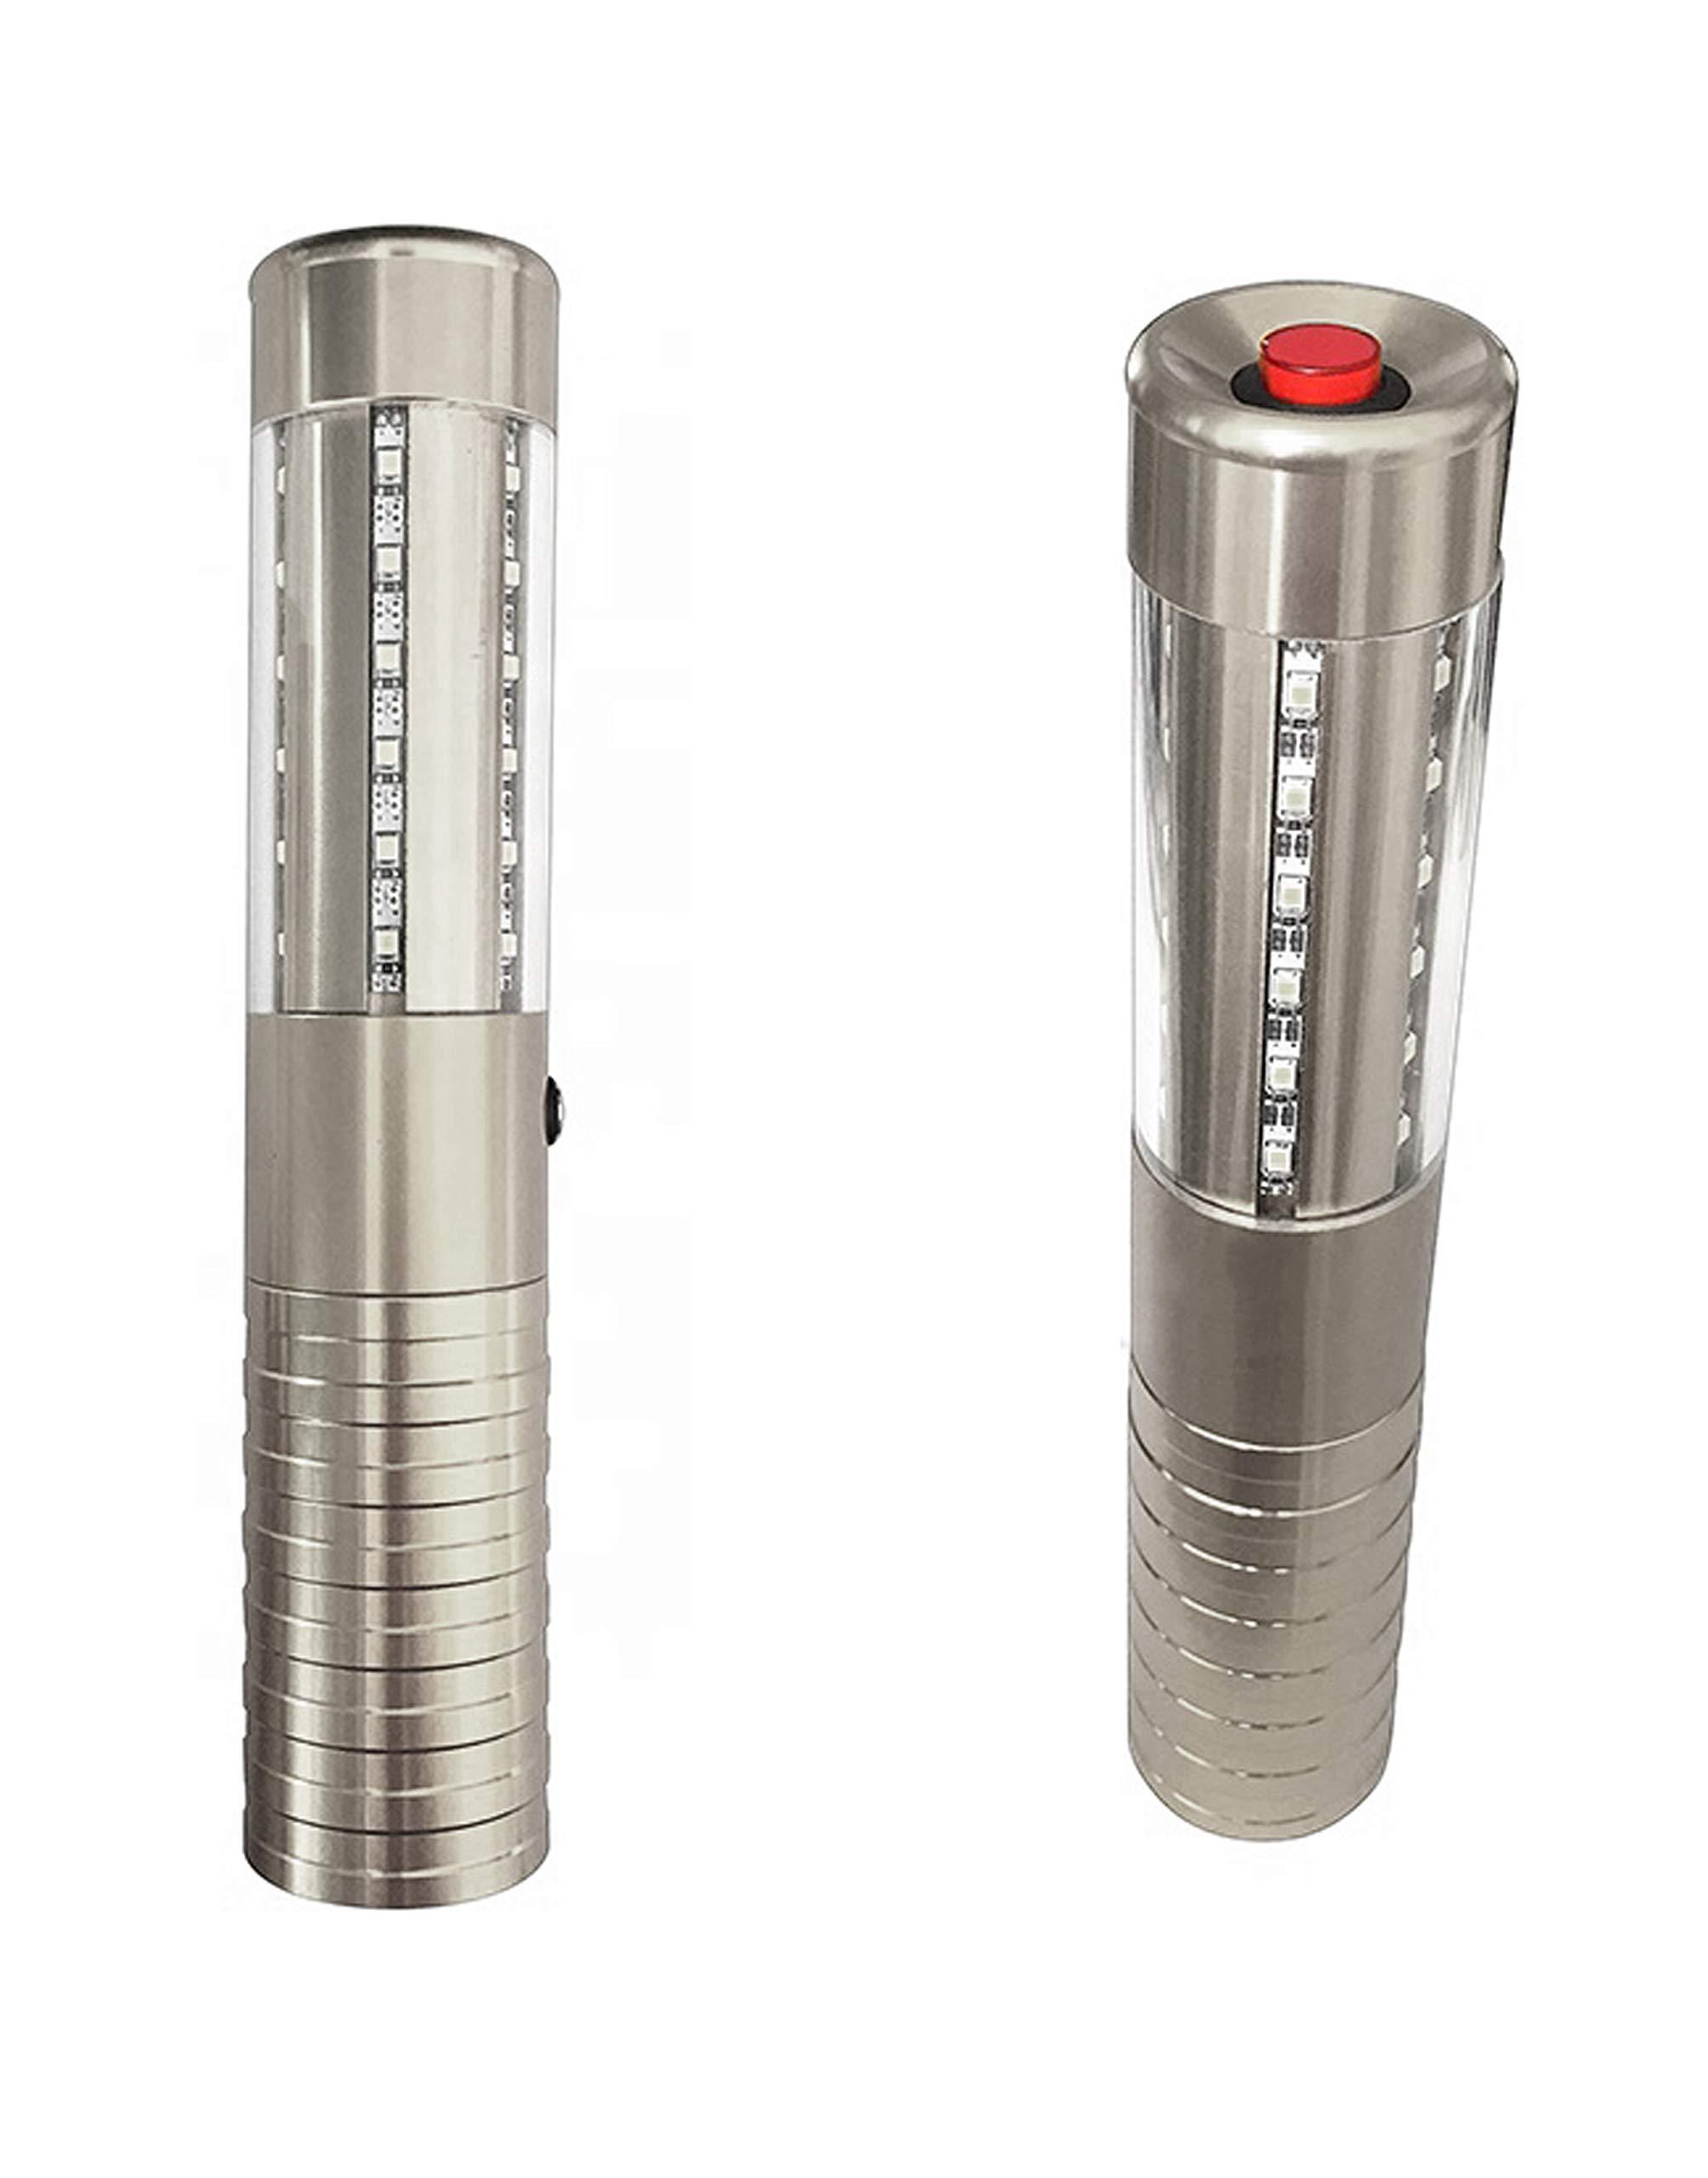 Fancy Supplies Premium LED Strobe Bottle Topper - Silver Rechargeable - Bottle Service for VIP Nightclubs led Bottle Topper or Baton (1 Piece, Silver)